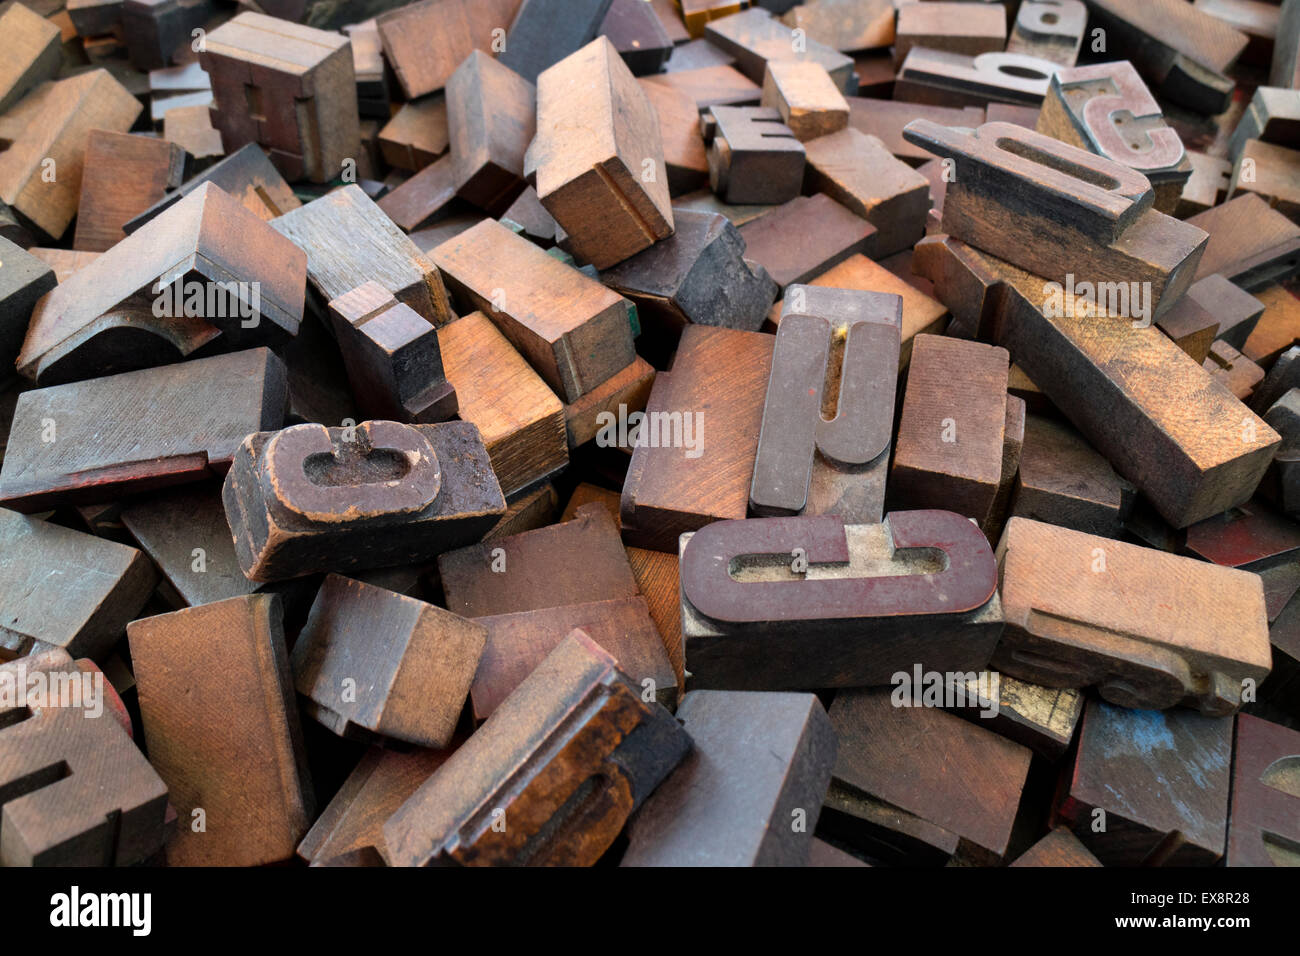 Montón de viejas cartas de madera tallada Imagen De Stock